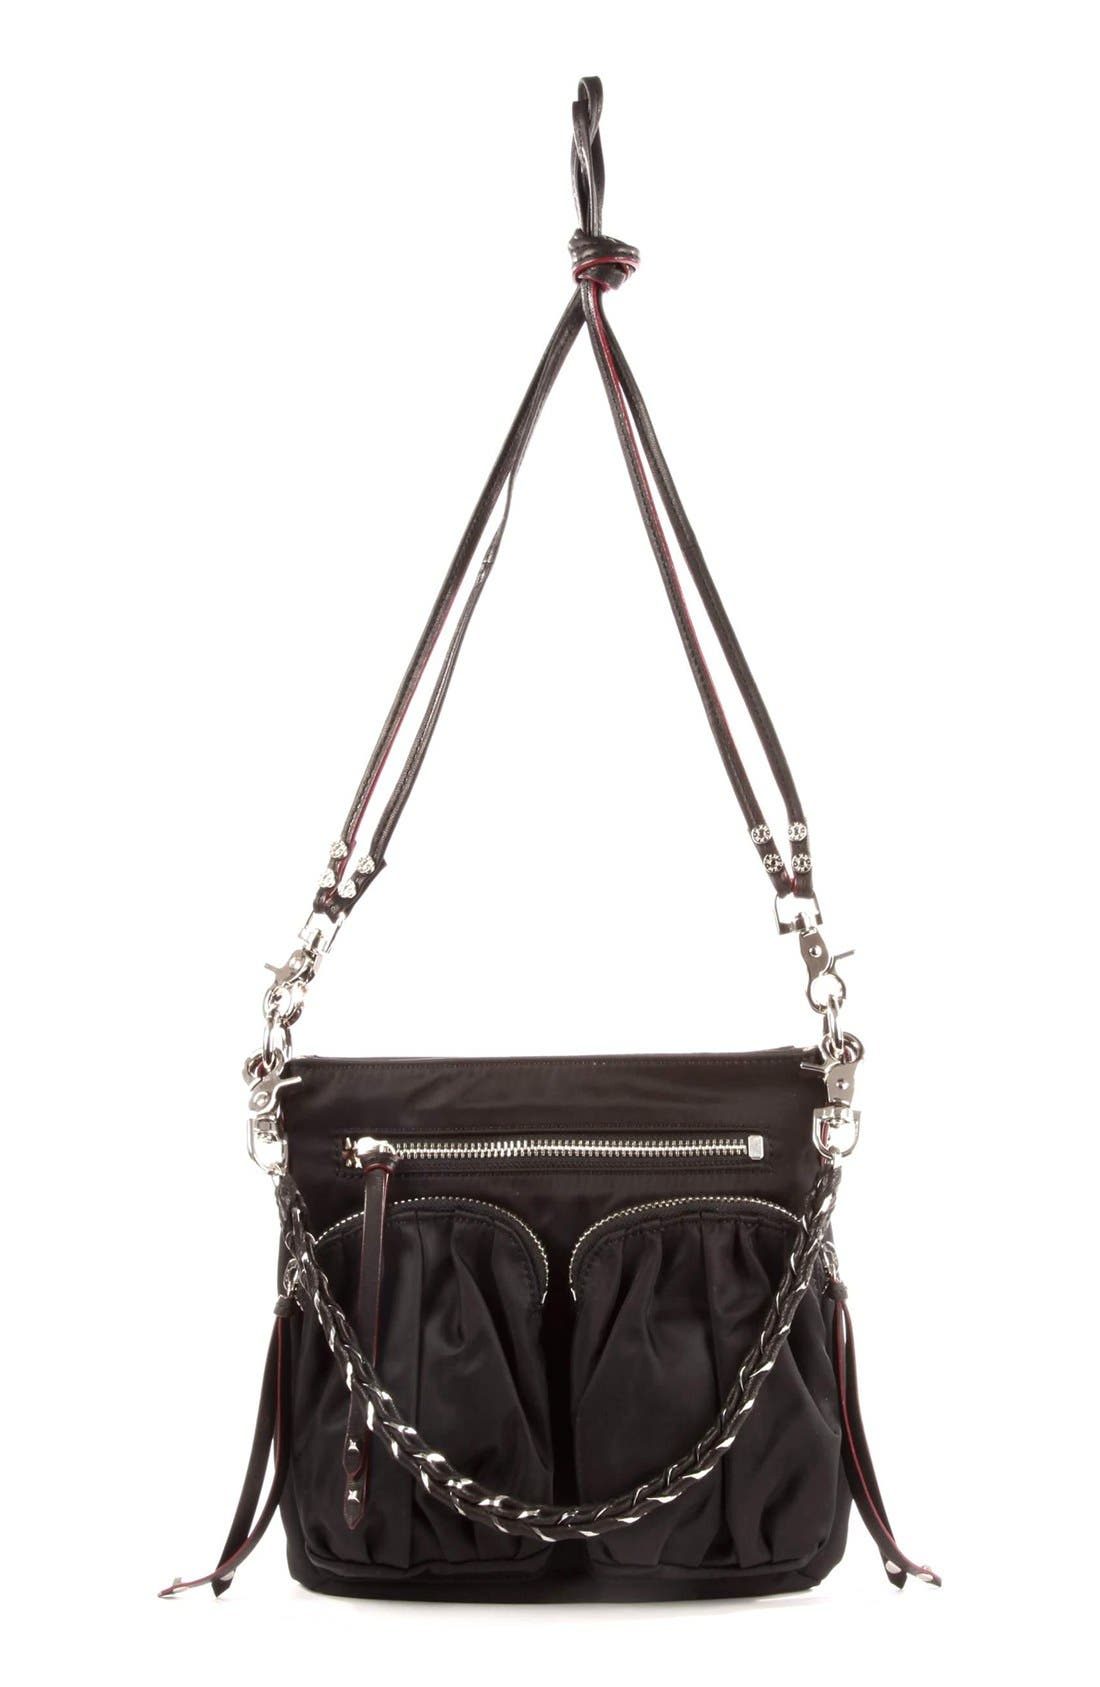 Alternate Image 1 Selected - MZ Wallace 'Sophie' Nylon Shoulder Bag